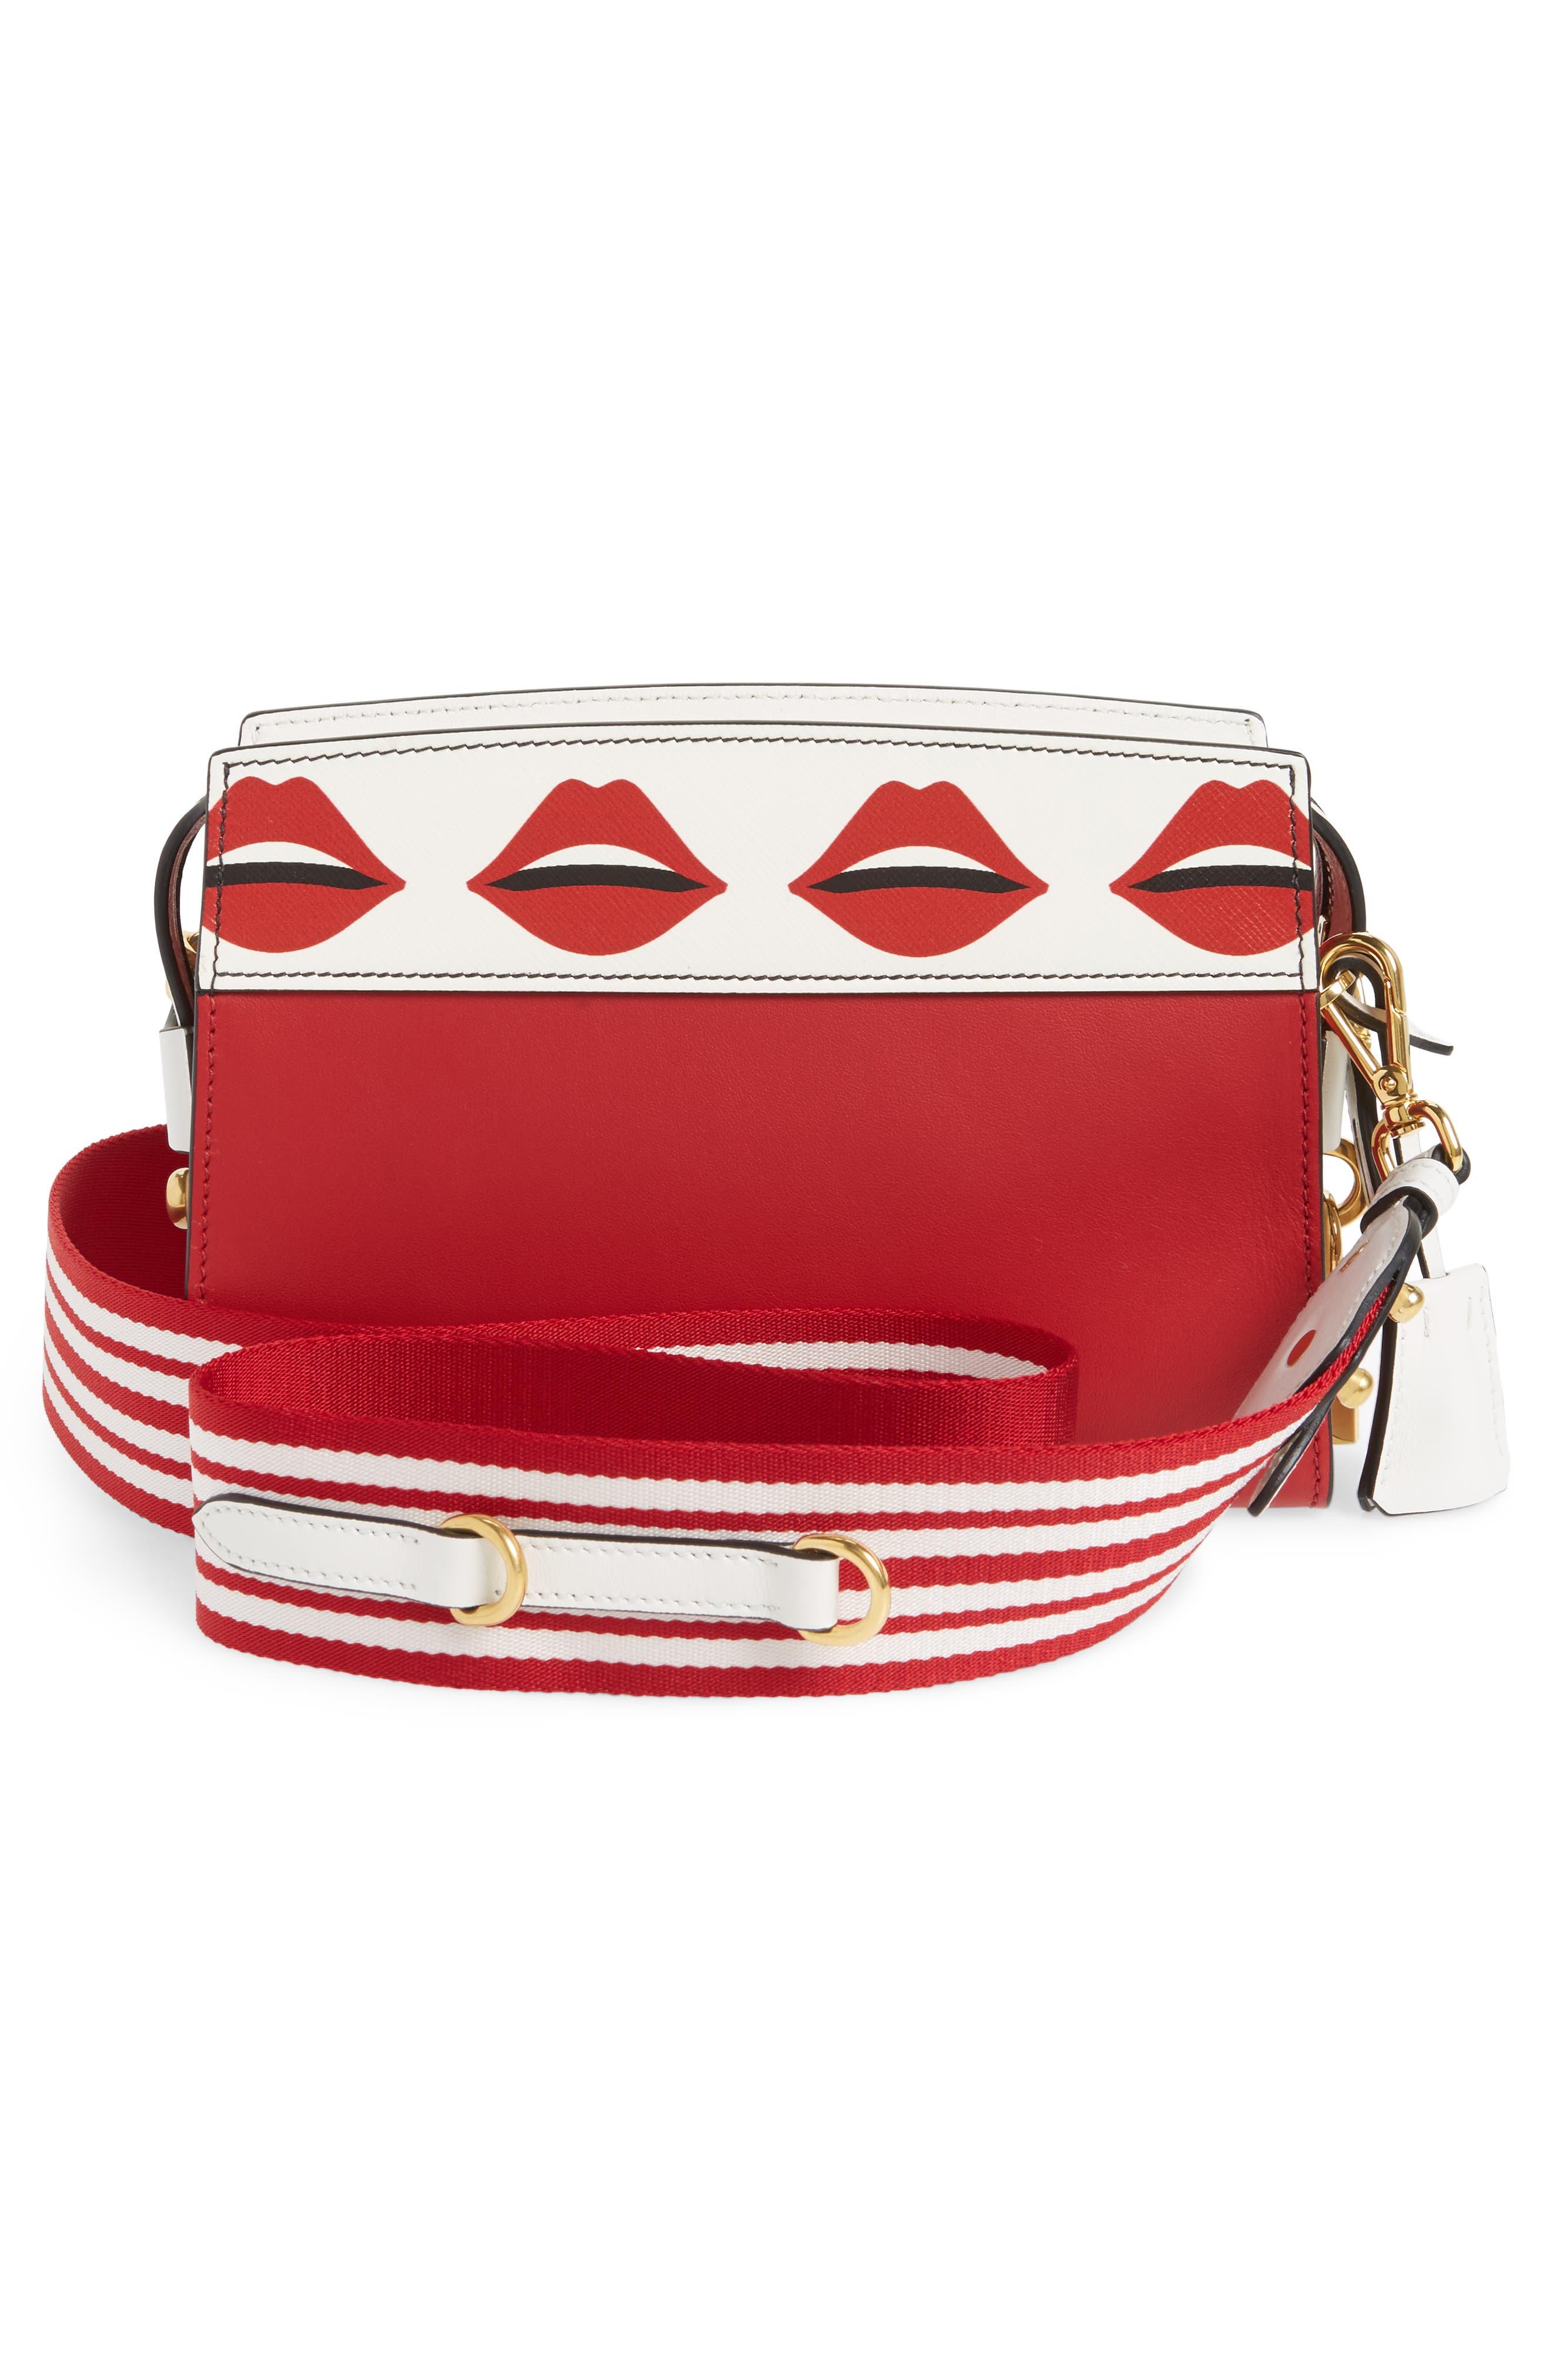 Esplanade Saffiano & City Calfskin Shoulder Bag,                             Alternate thumbnail 3, color,                             Fuoco